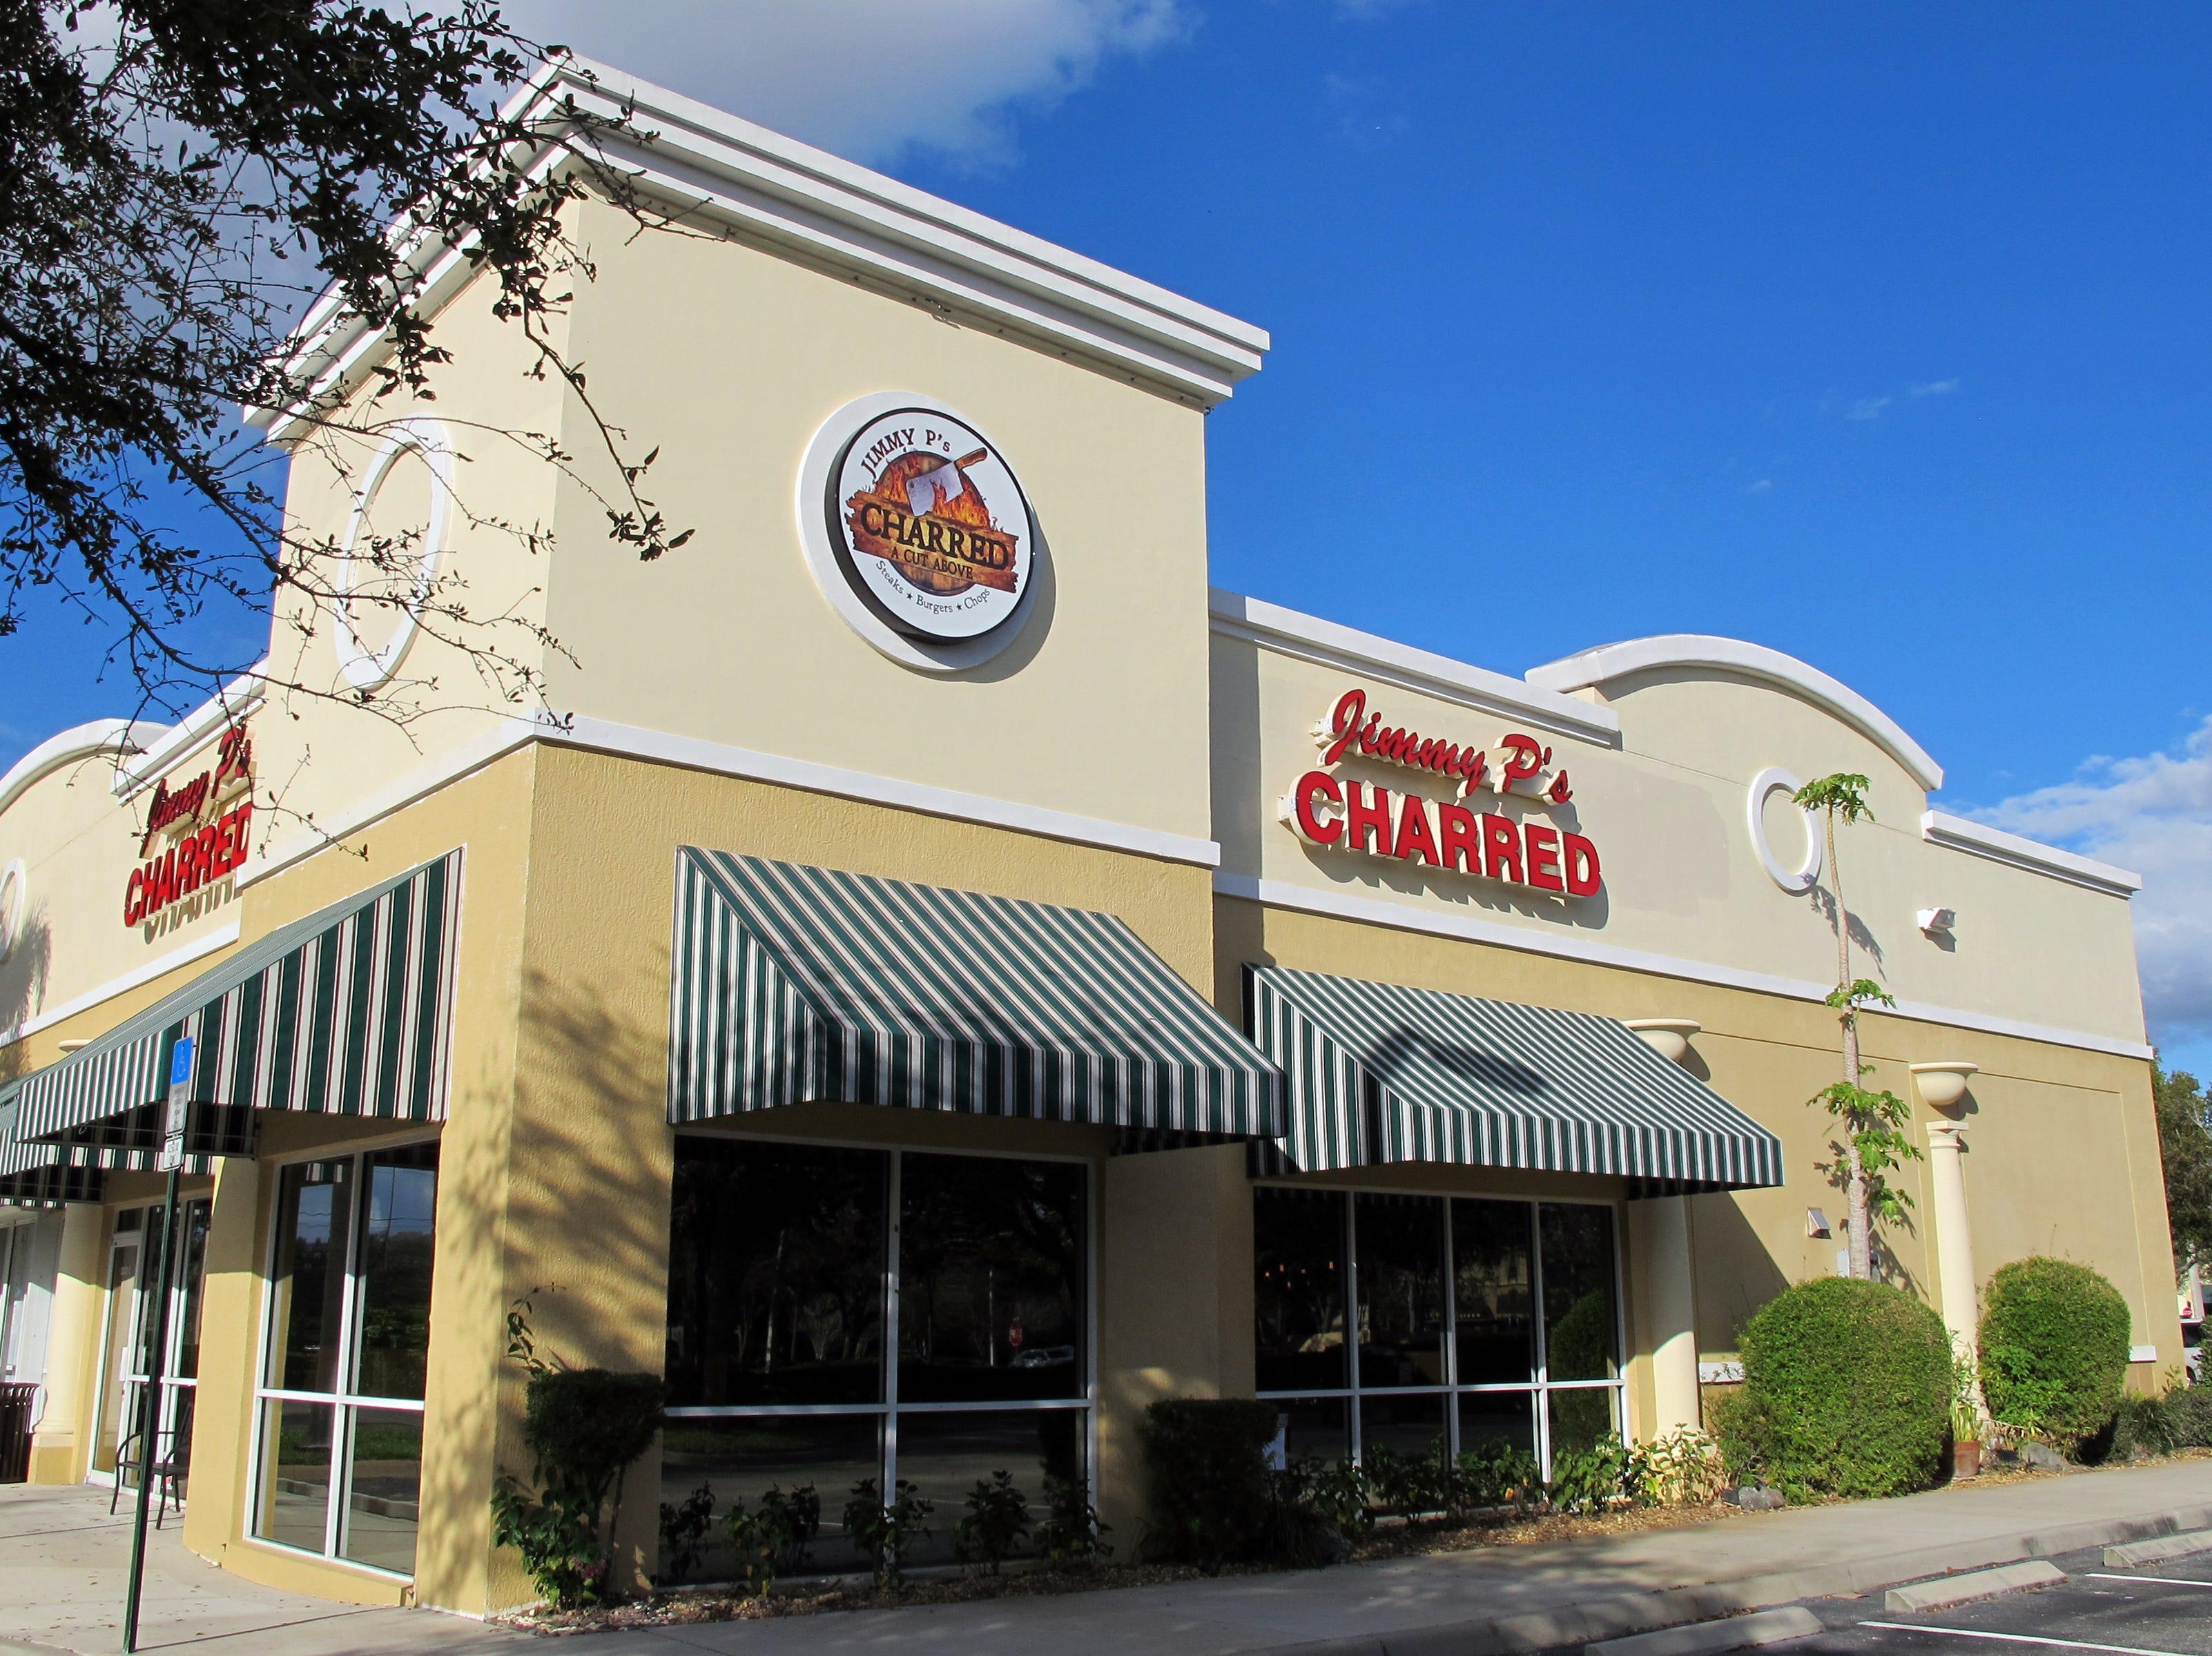 Jimmy P's Charred opened Feb. 8, 2019, on U.S. 41 in Bonita Springs.